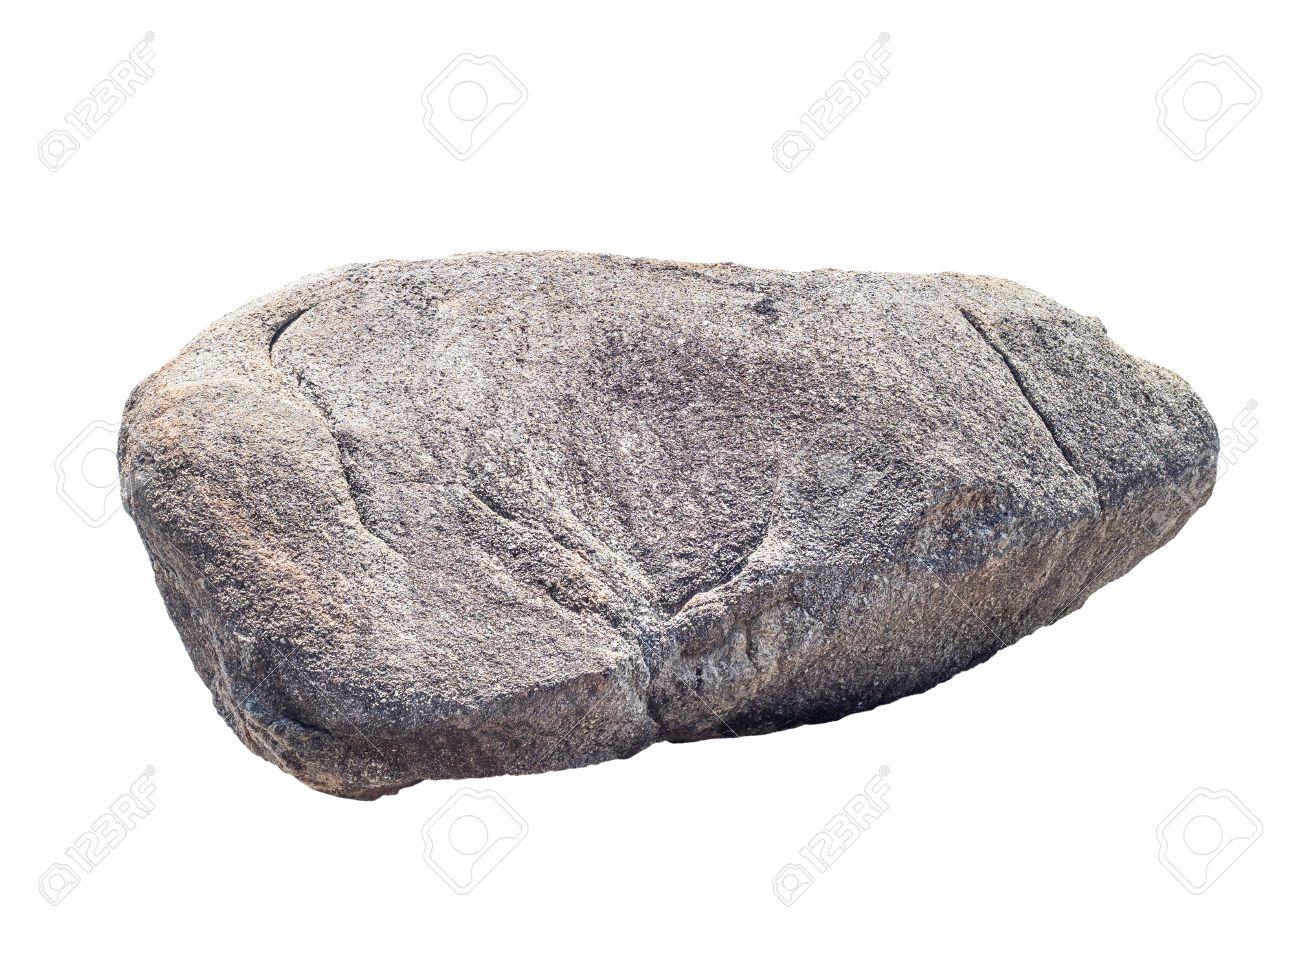 Large White Granite Rock : Big granite rock stone isolated on white